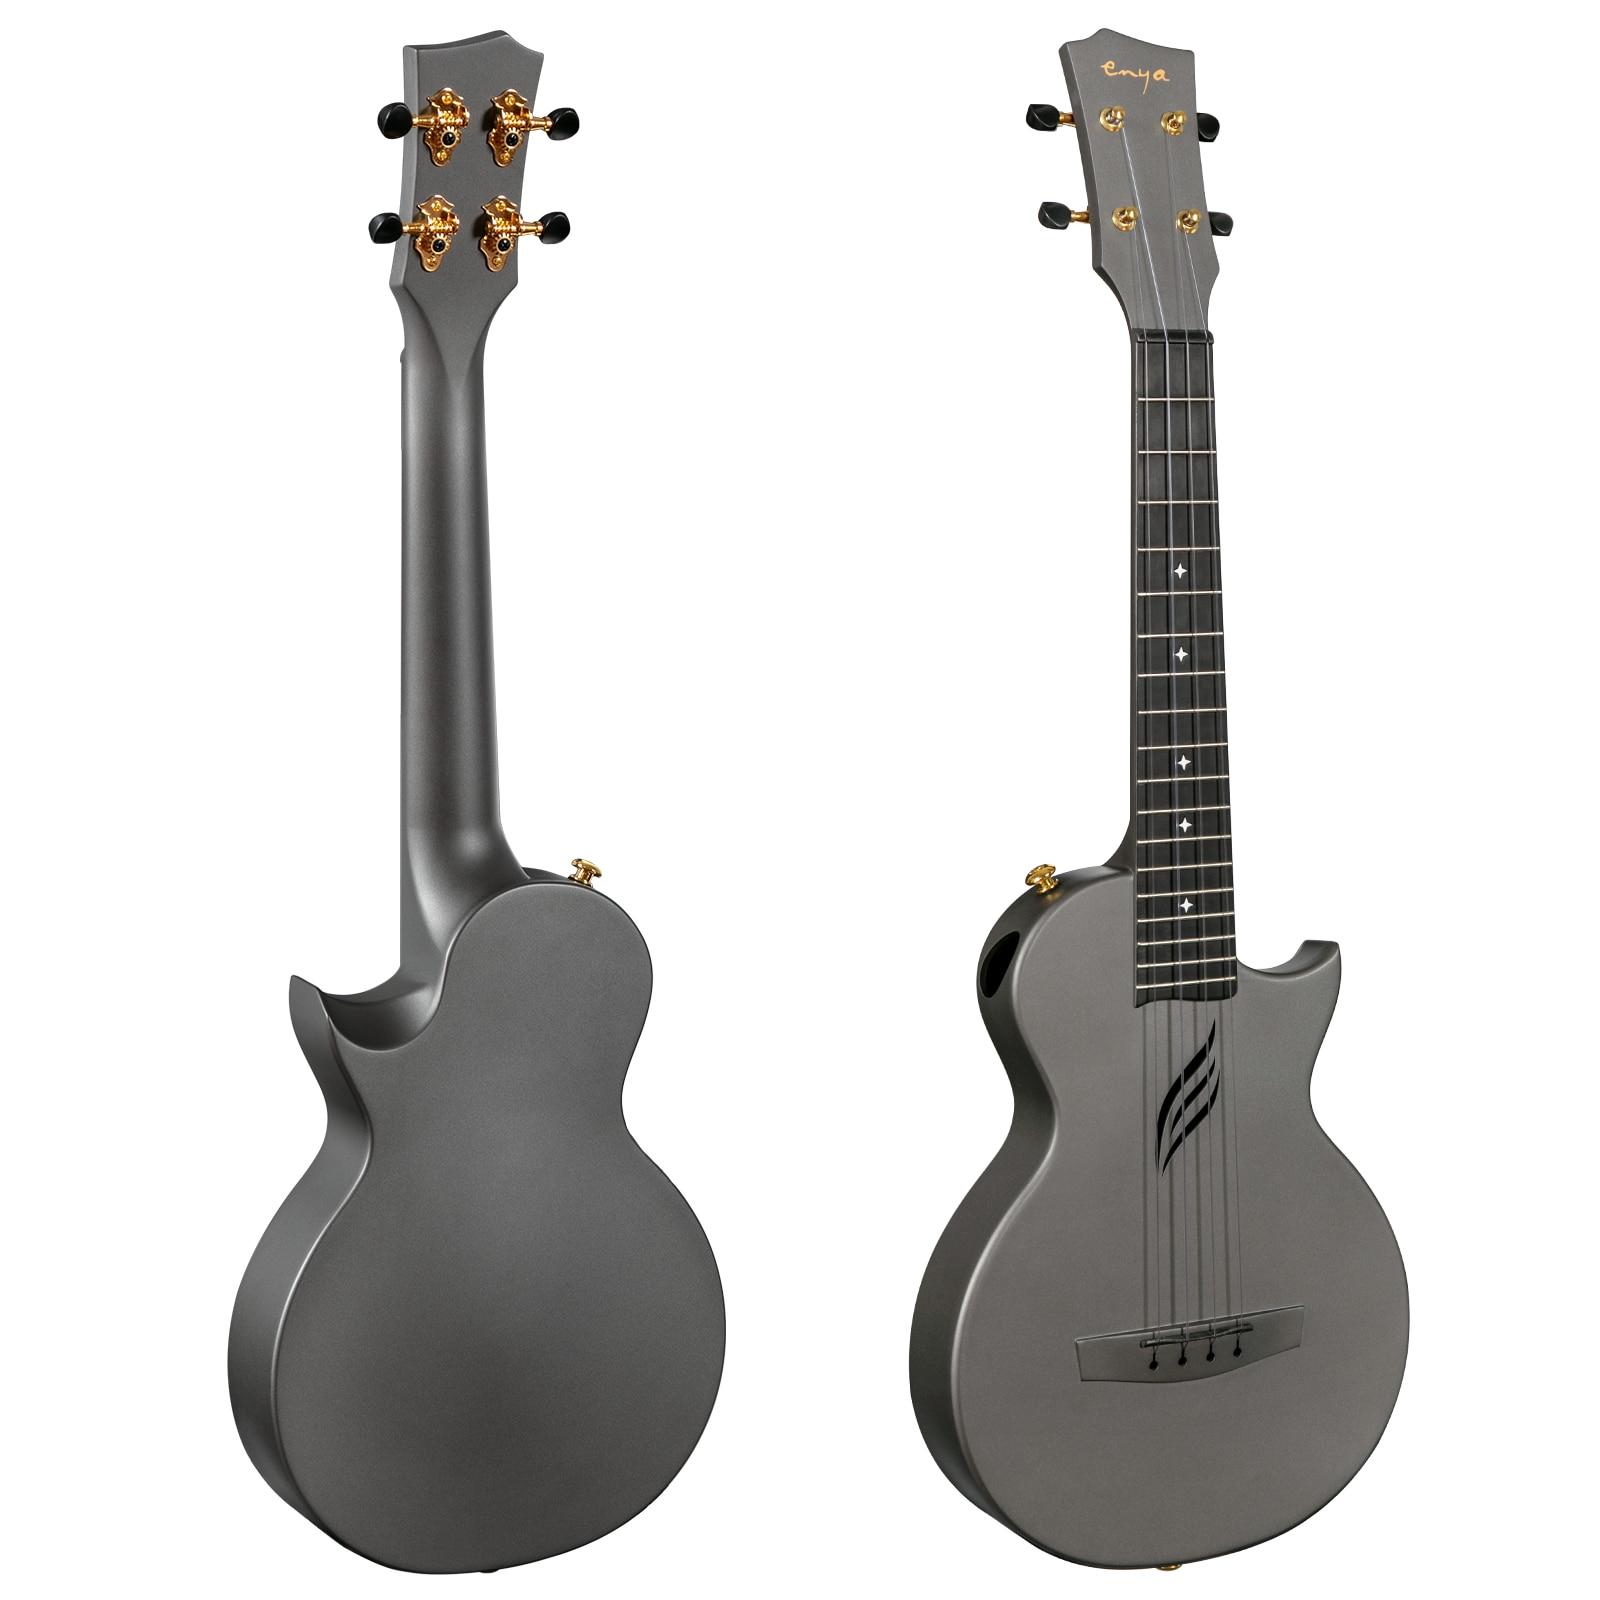 Enya Tenor Ukulele 26 Inch Carbon Fiber Cutaway Travel Ukelele Music Instrument Beginner Kit Including Case Strap Capo Strings enlarge